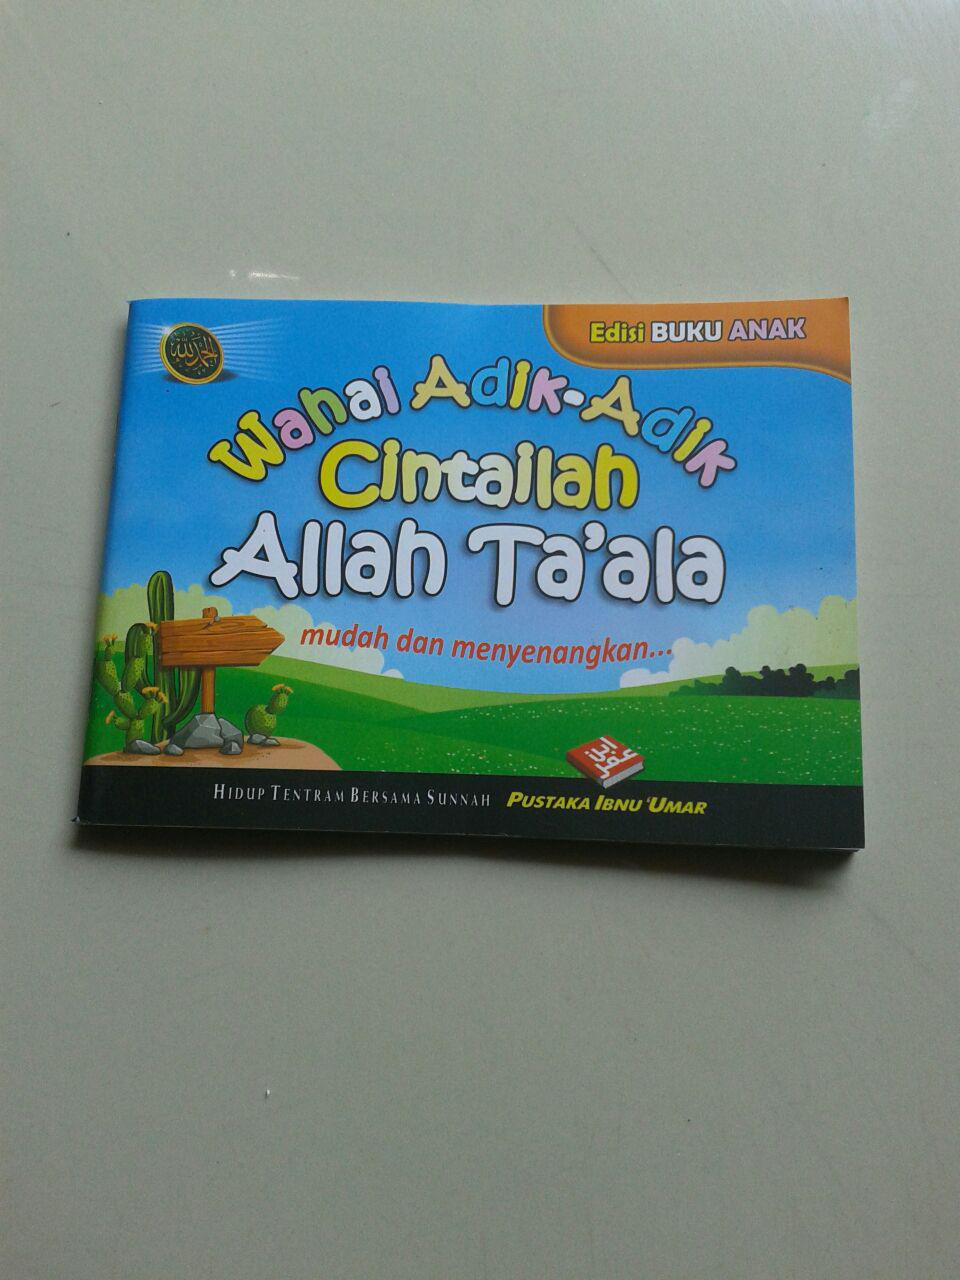 Buku Saku Anak Wahai Adik Adik Cintailah Allah Ta'ala cover